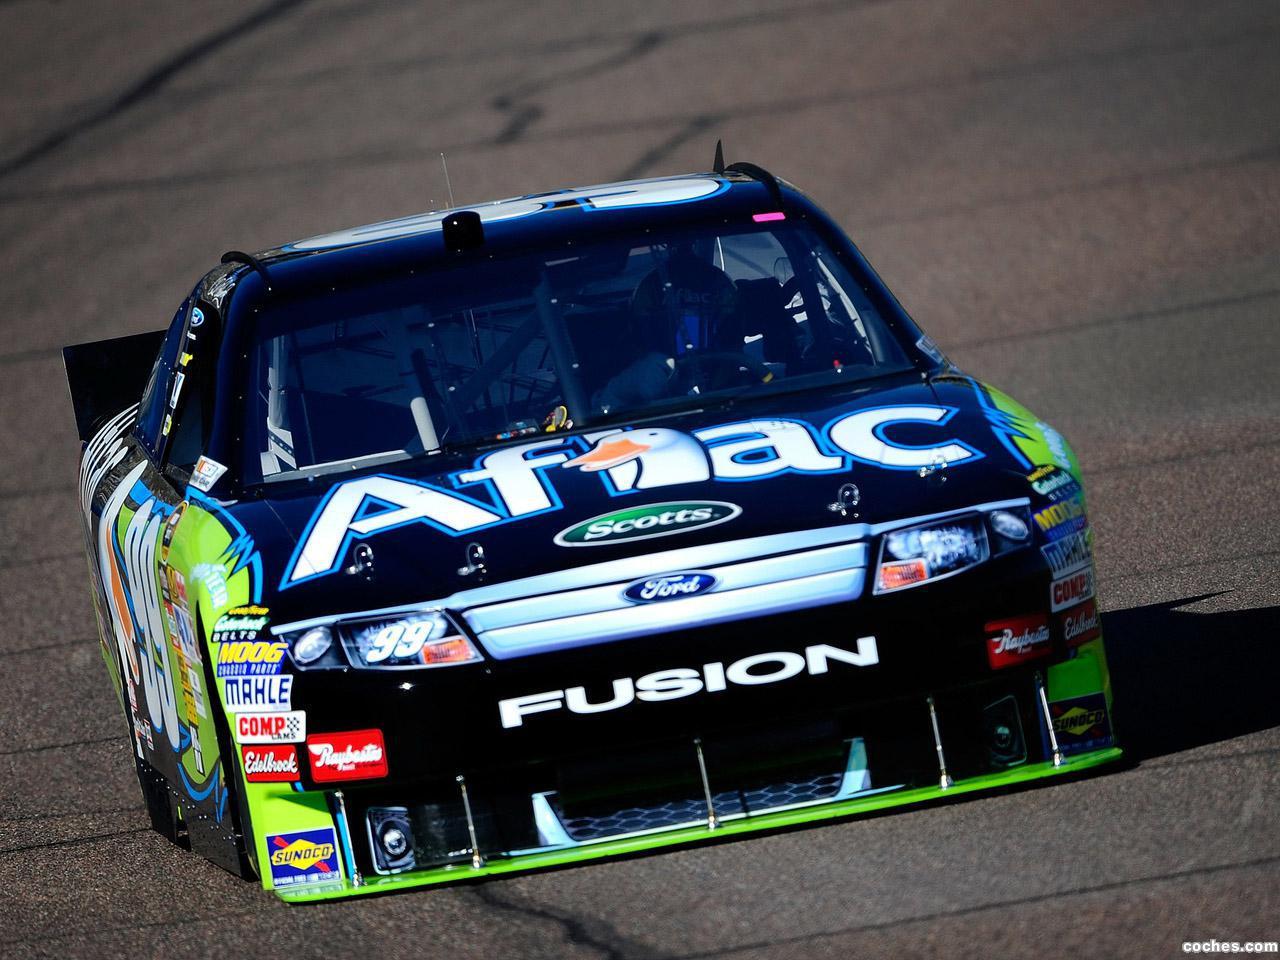 Foto 11 de Ford Fusion NASCAR Sprint Cup Series Race Car 2012